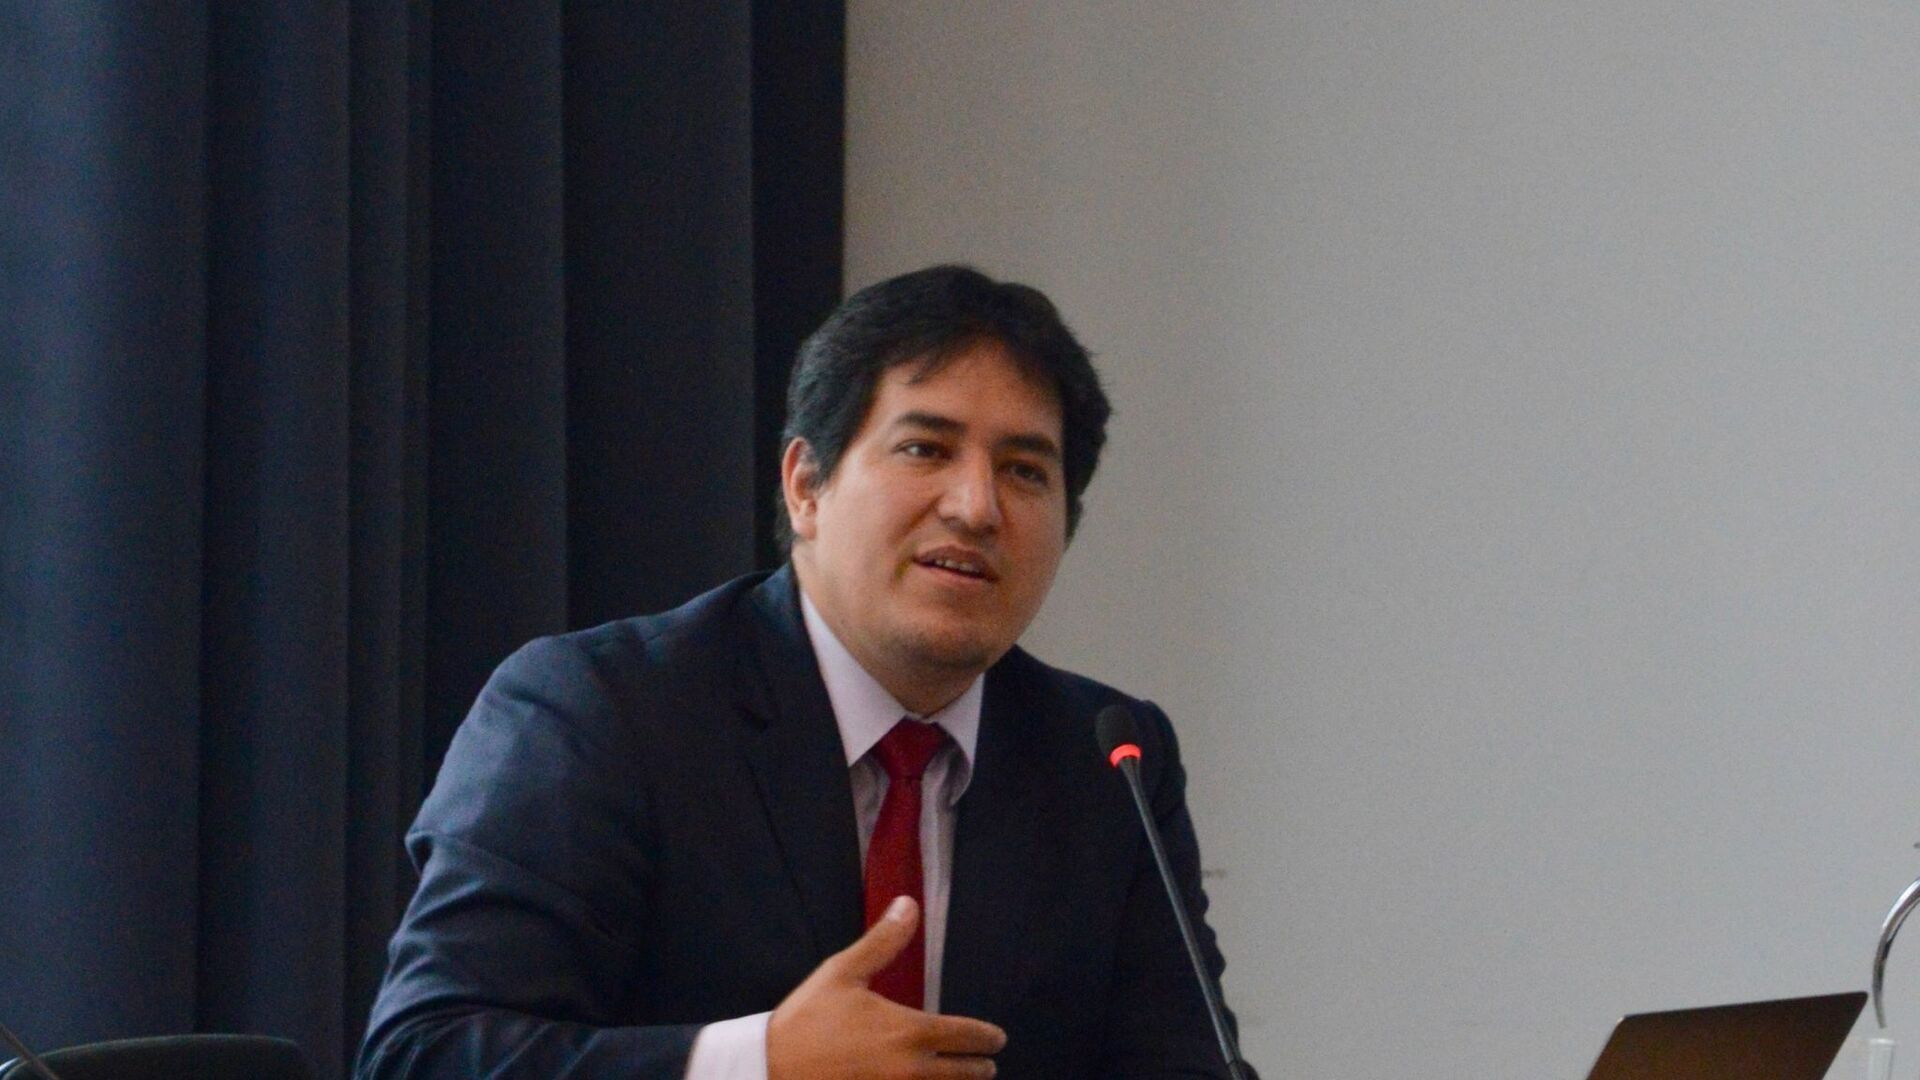 Andrés Arauz, el candidato a presidente de Ecuador - Sputnik Mundo, 1920, 30.03.2021